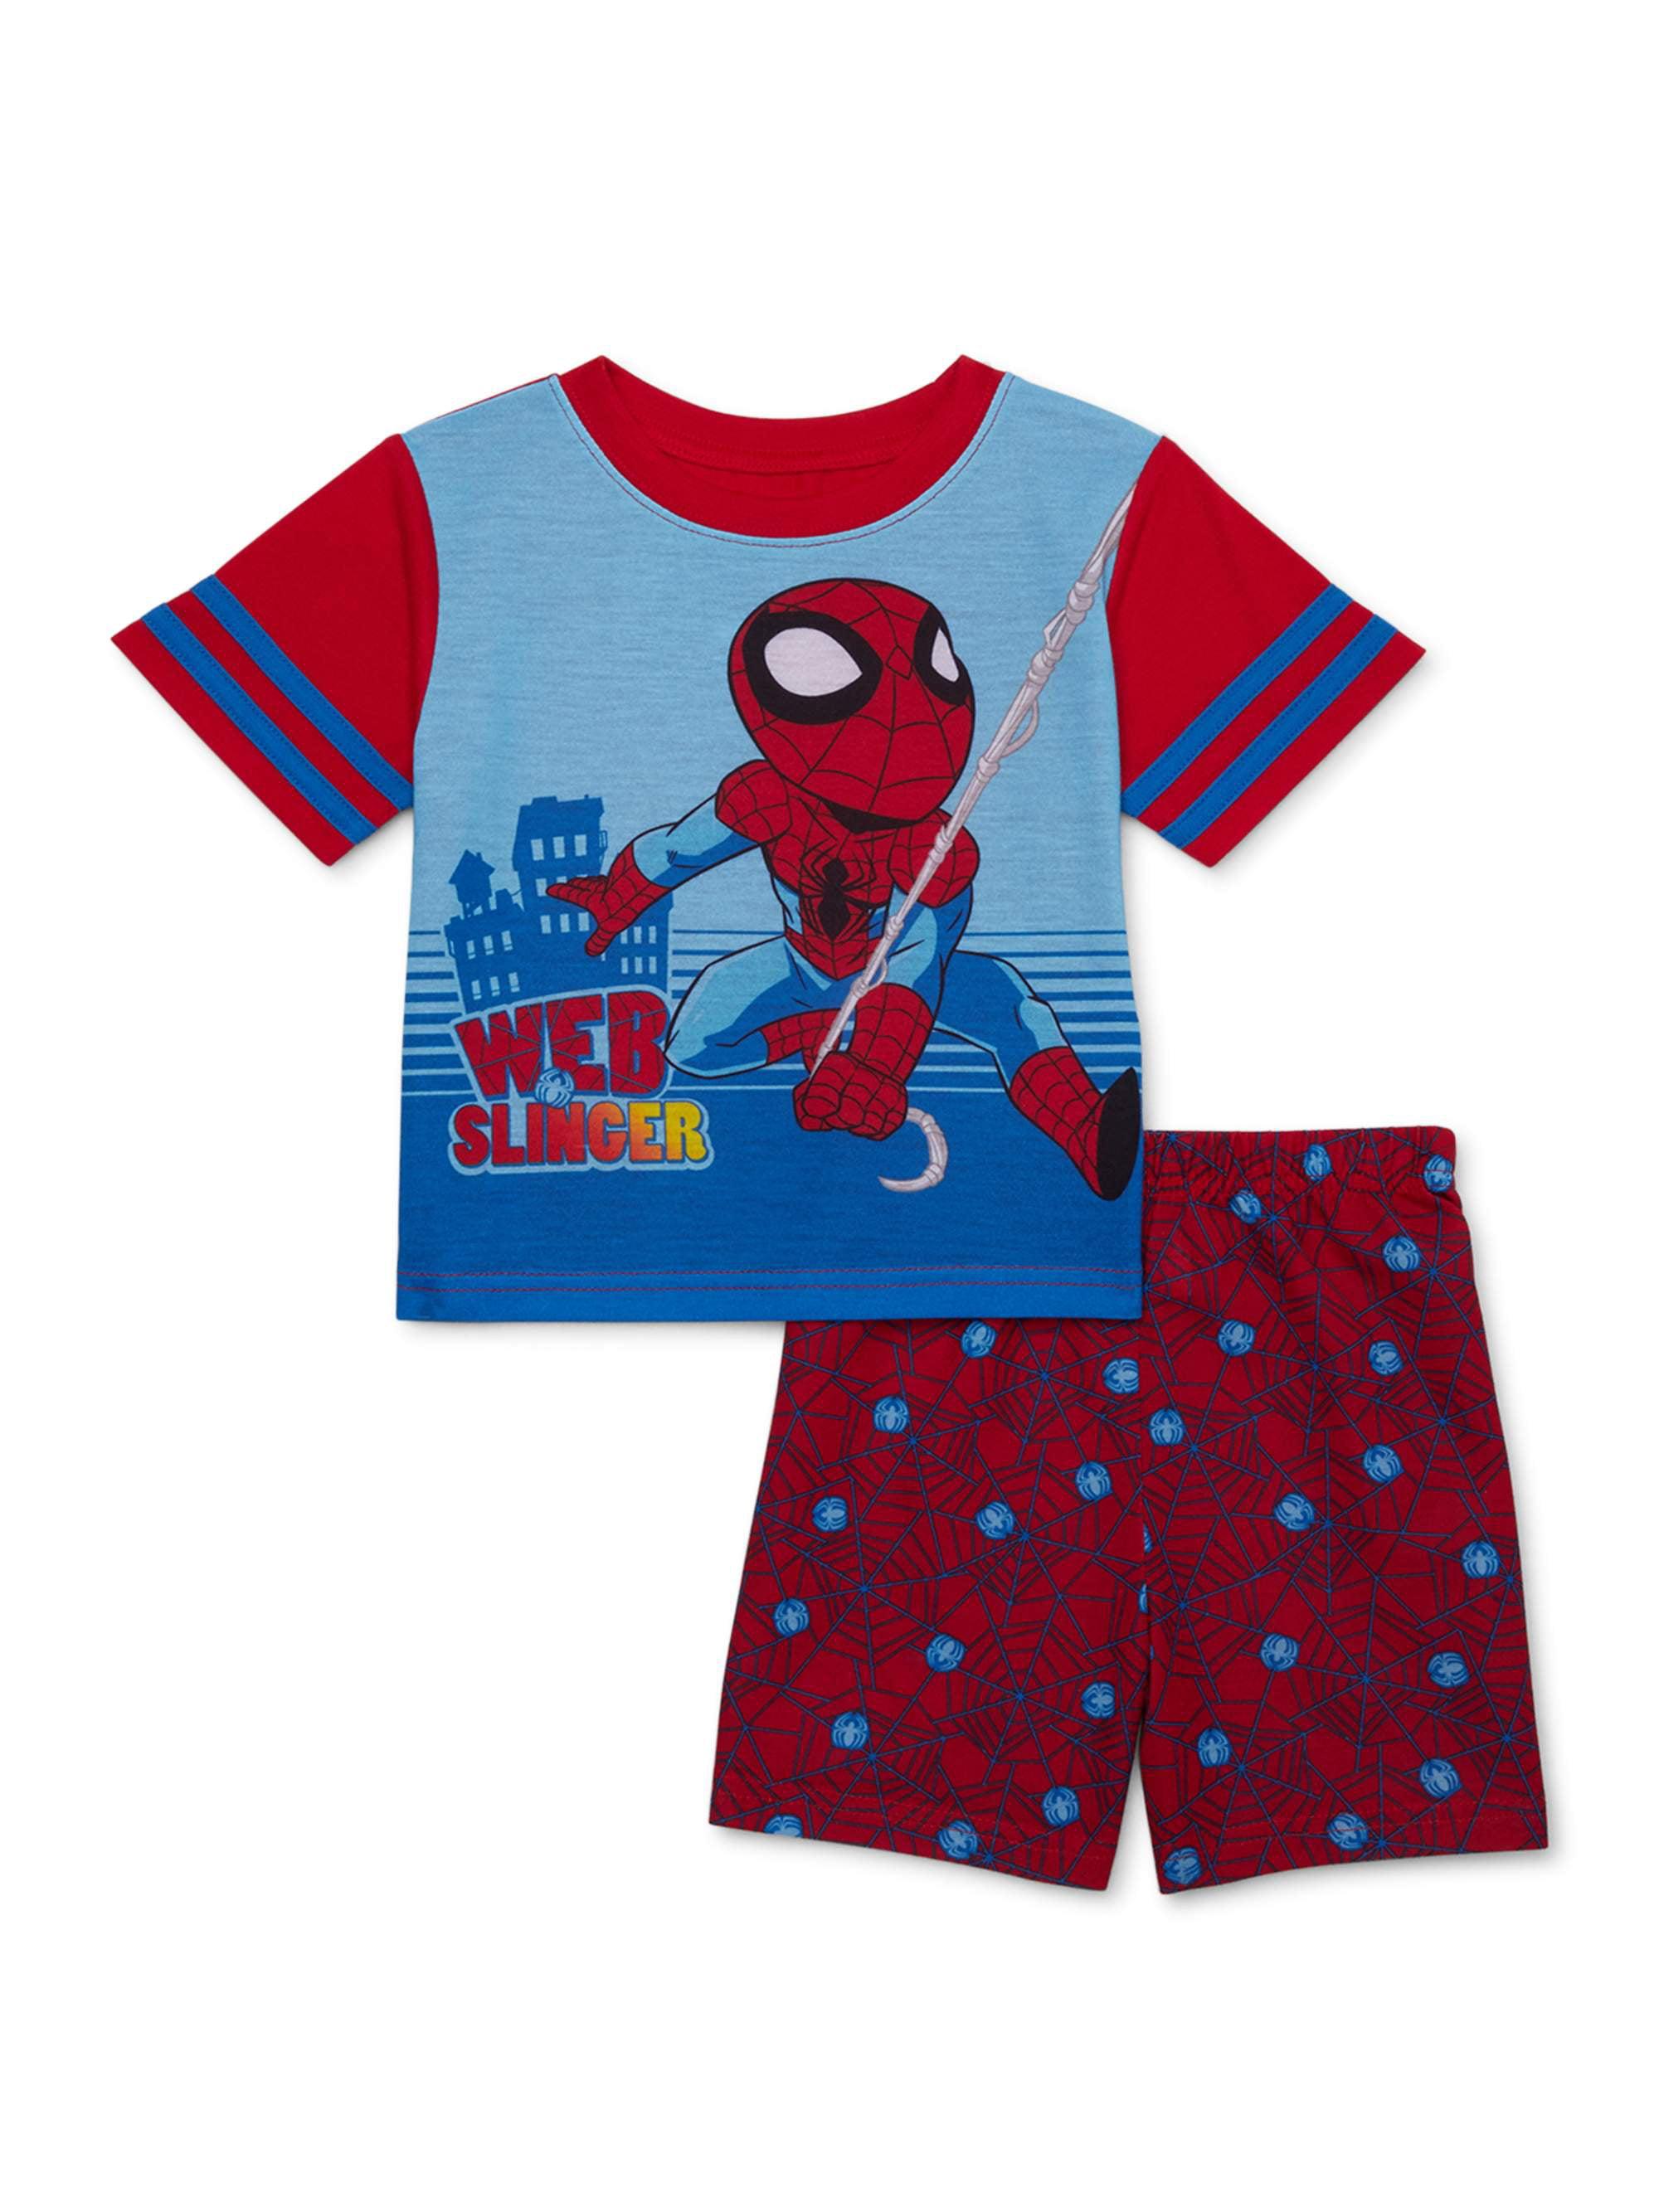 Spiderman Short Sleeve Shirt Boy Size 8 Small NWT